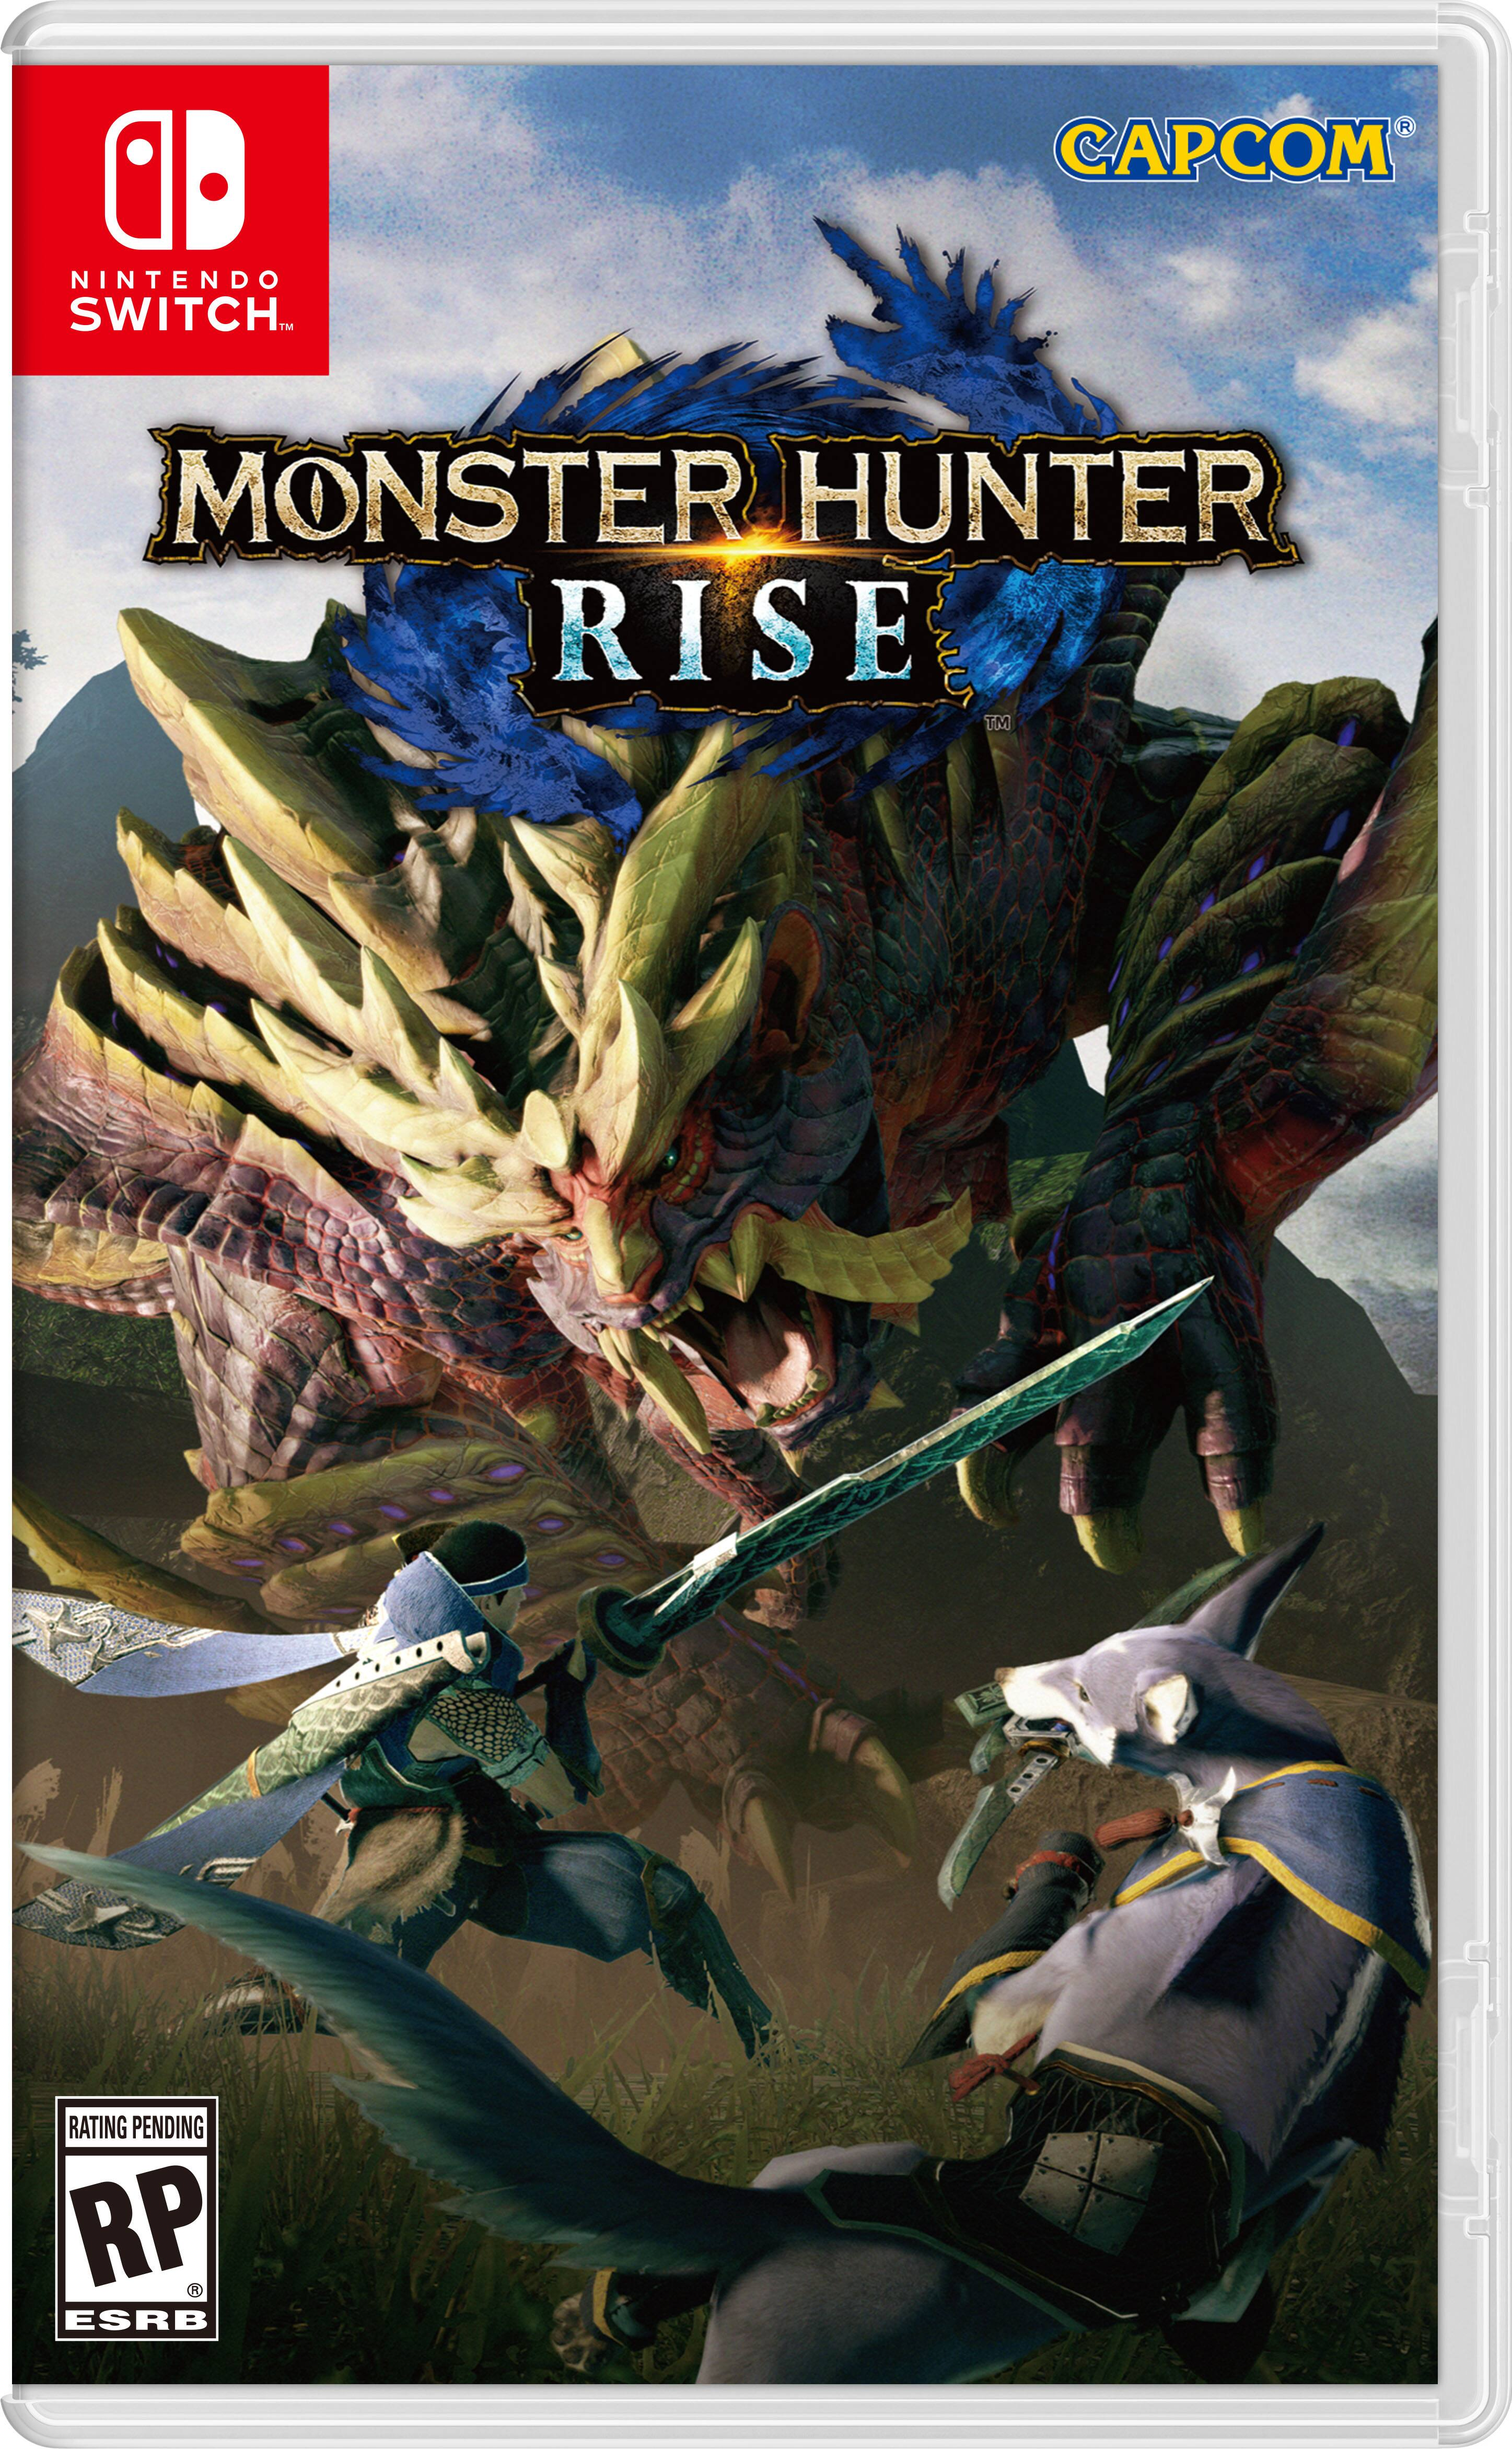 Monster Hunter Rise Nintendo Switch $49.94 at walmart.com